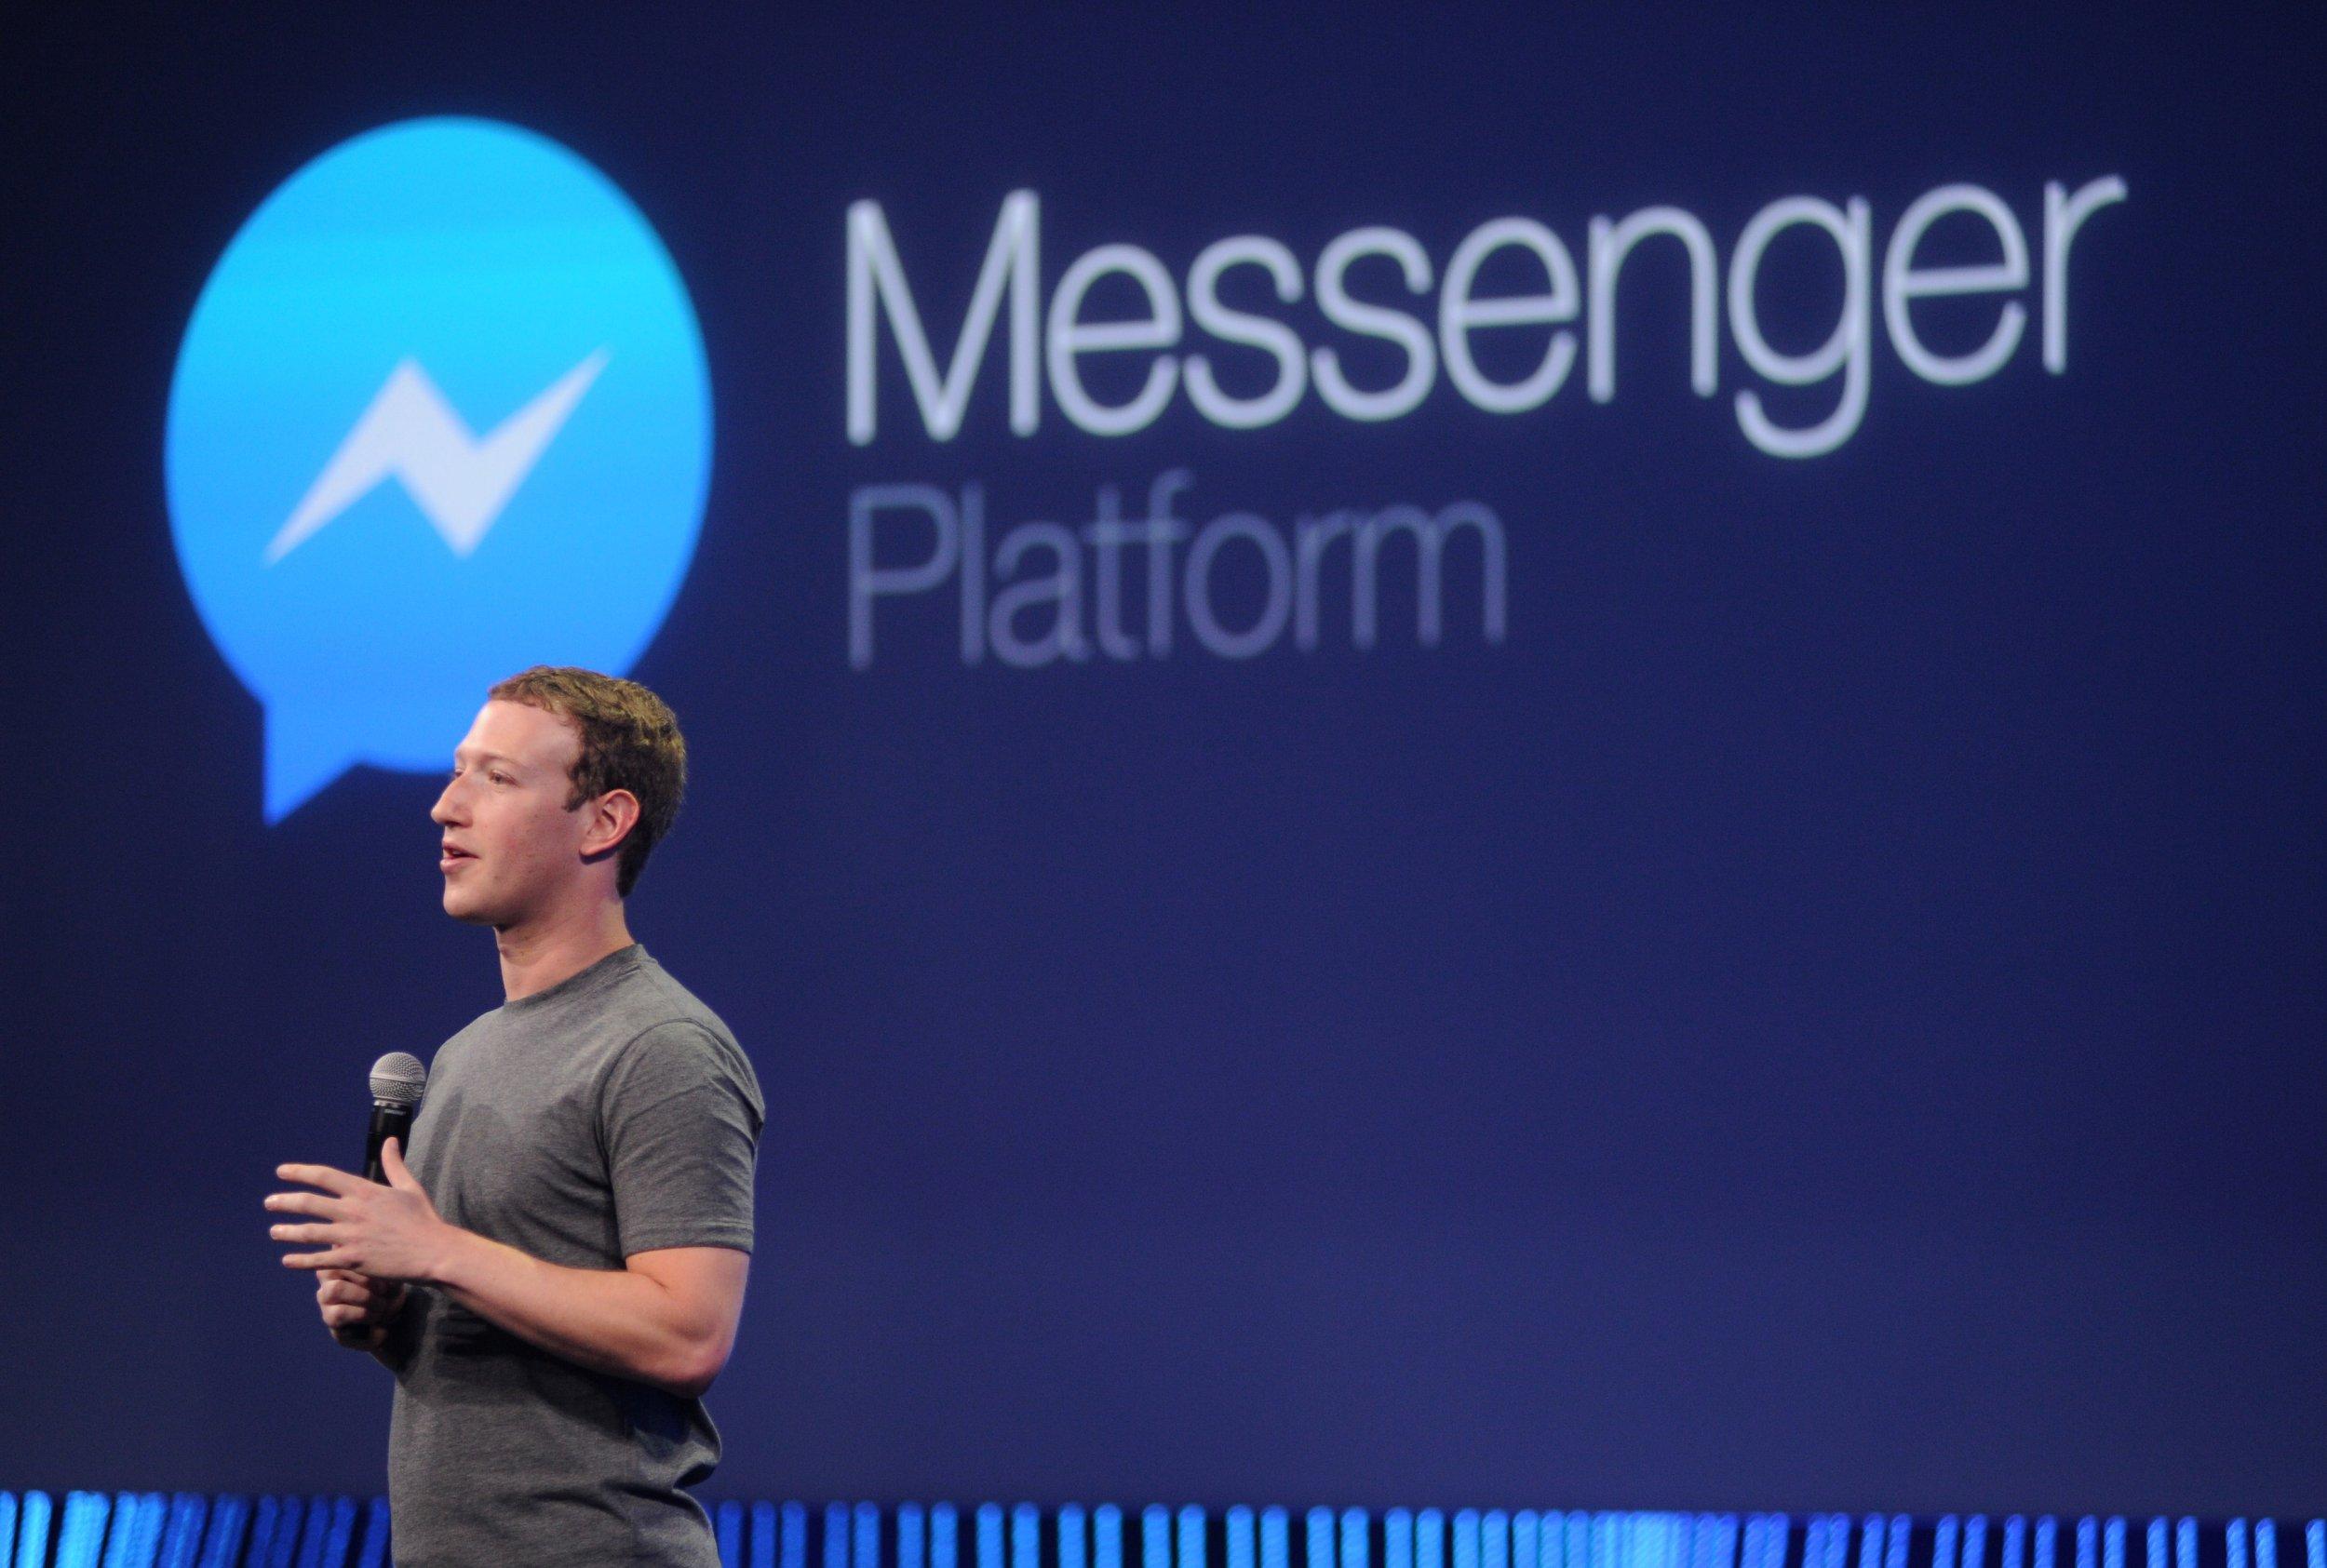 Facebook is testing self-destructing Messenger chats